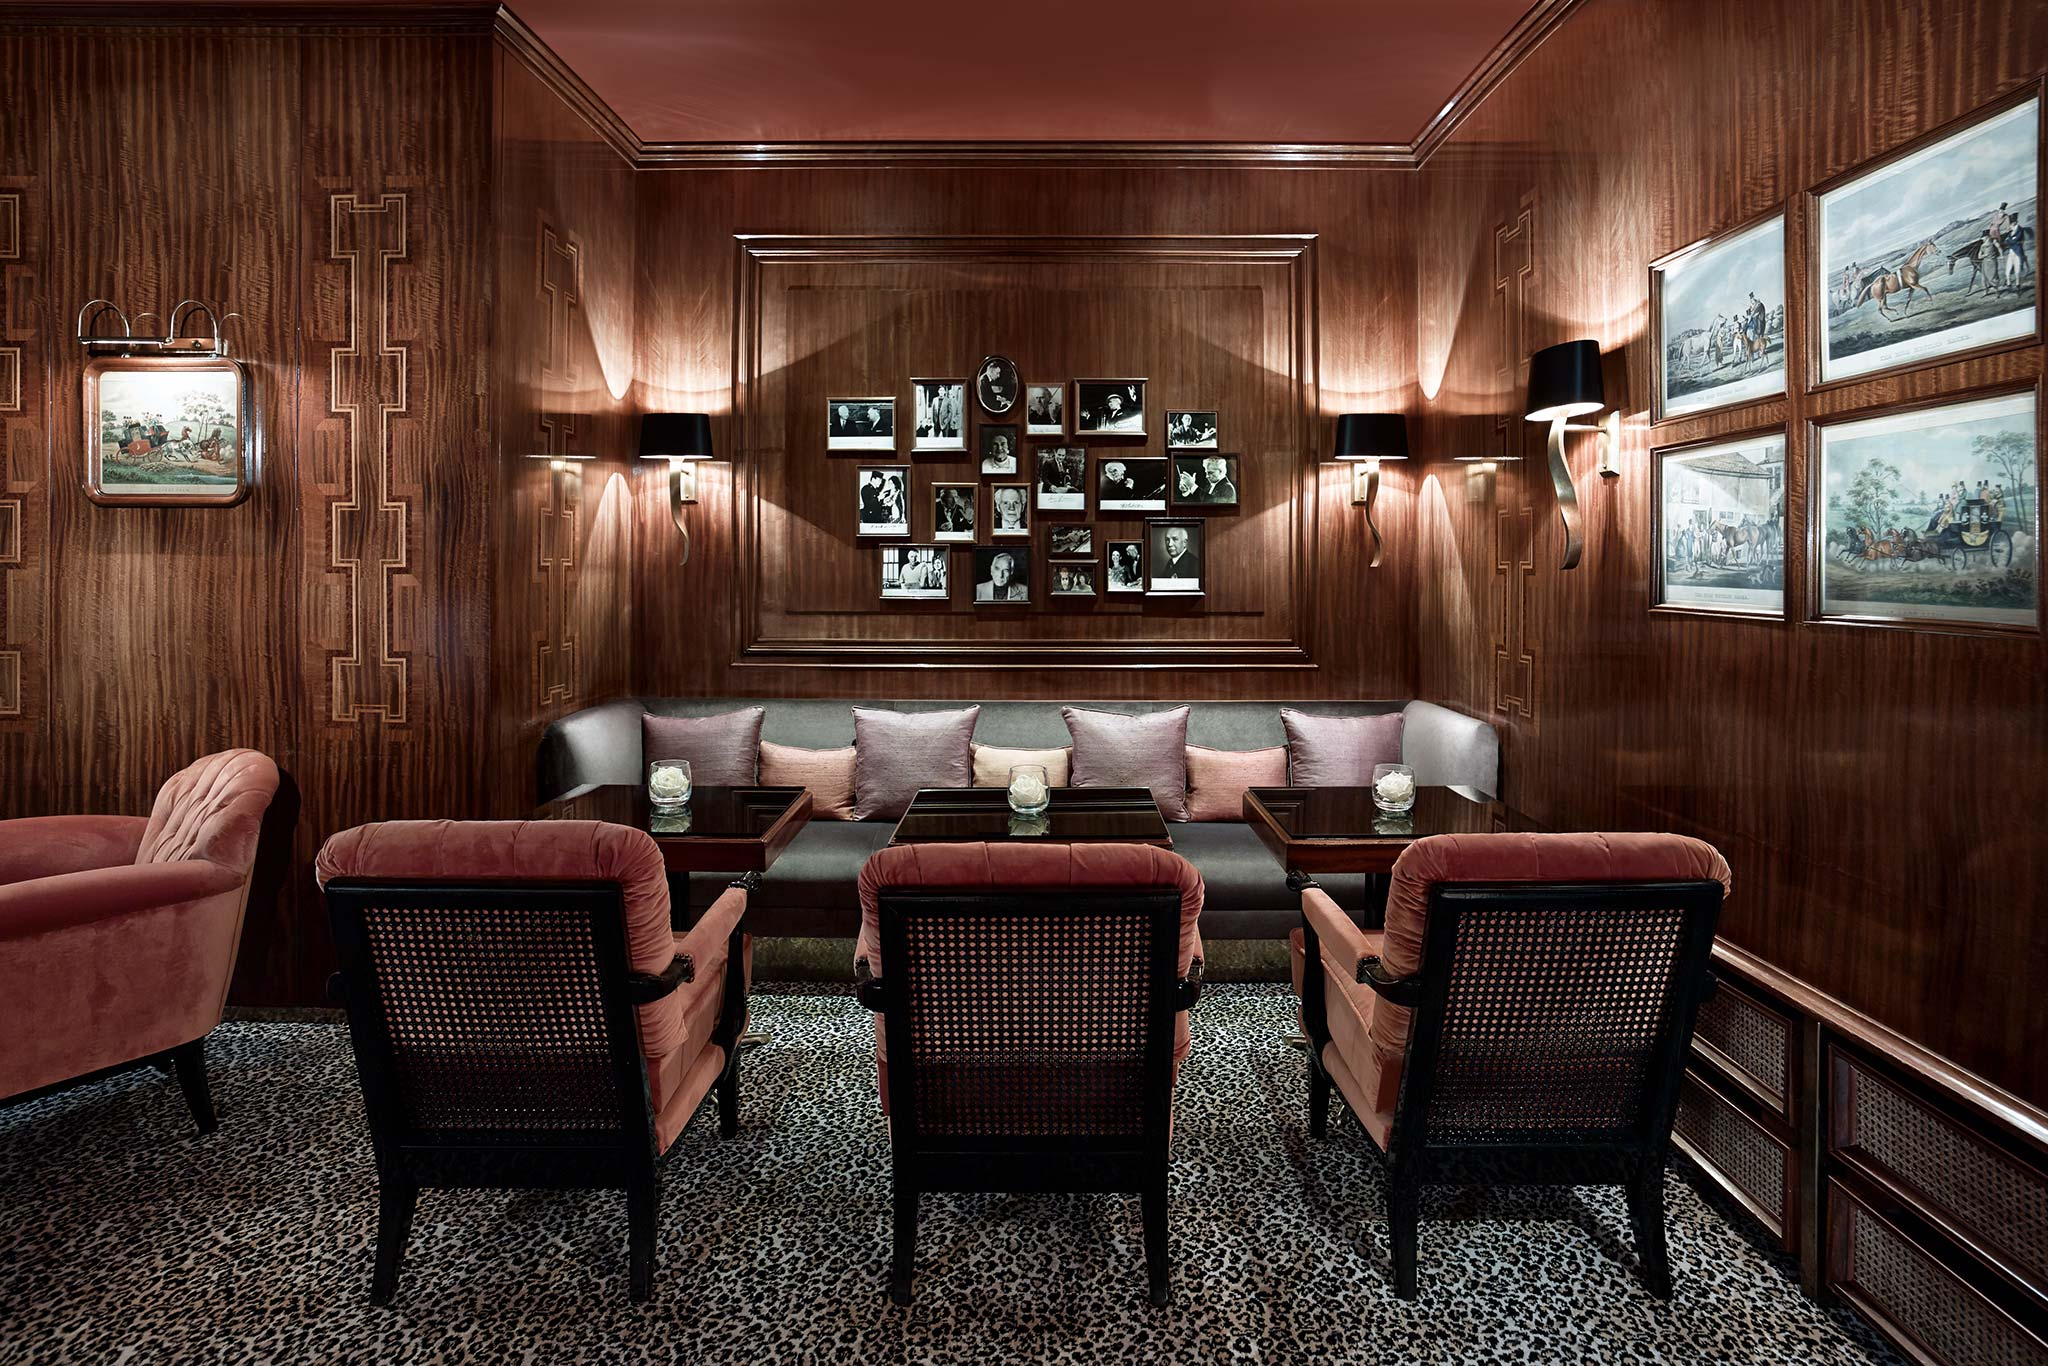 Bristol Bar in 1010 Wien - Falstaff